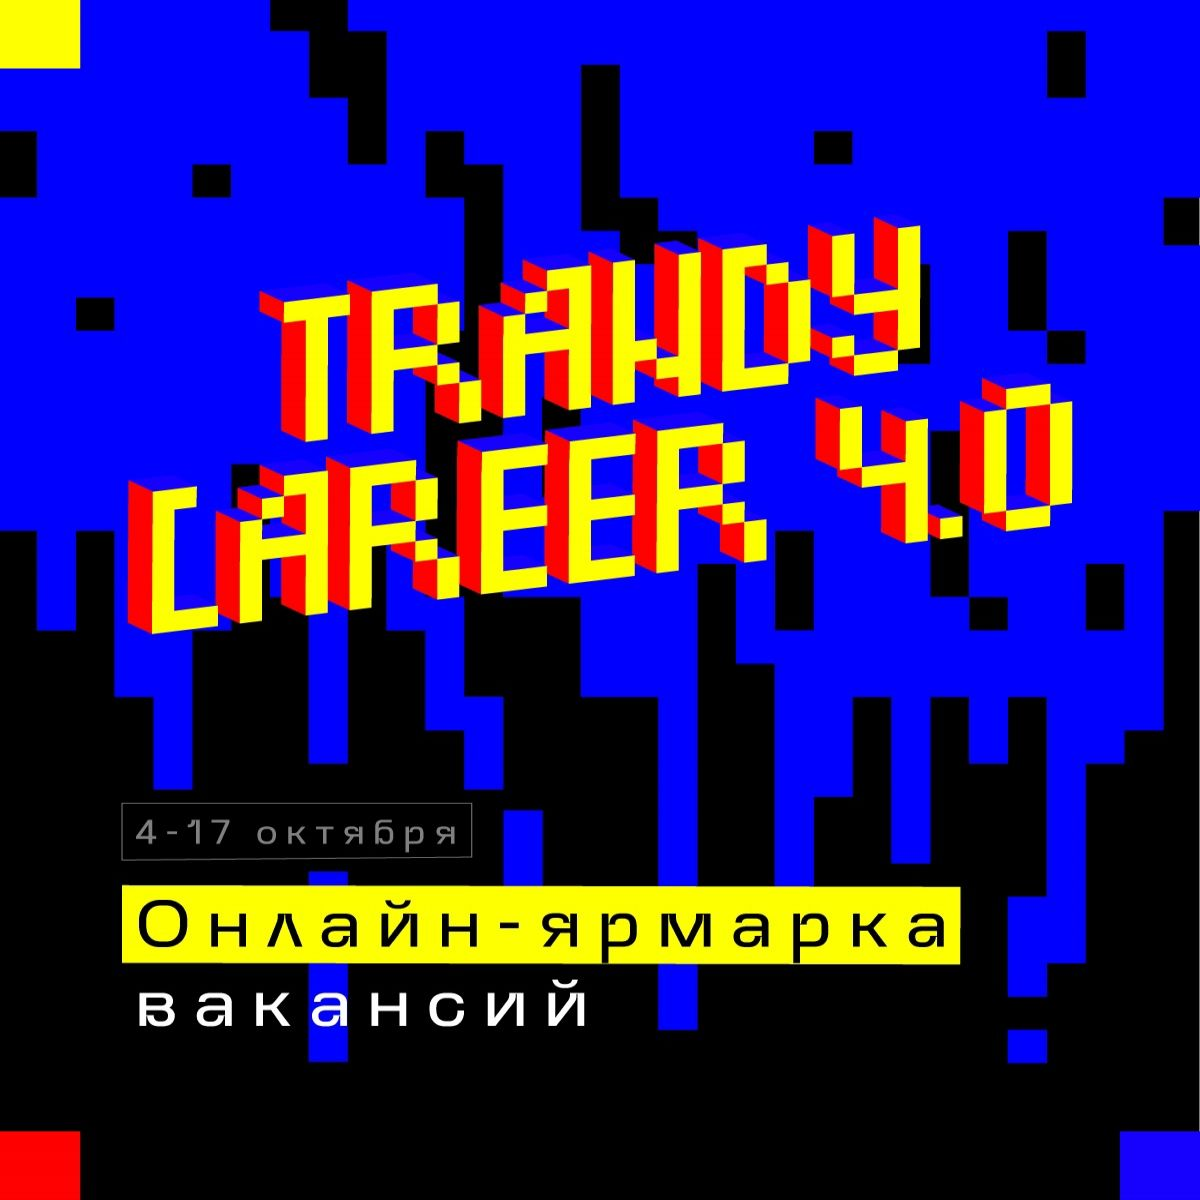 Онлайн-ярмарка вакансий trANDY career 4.0